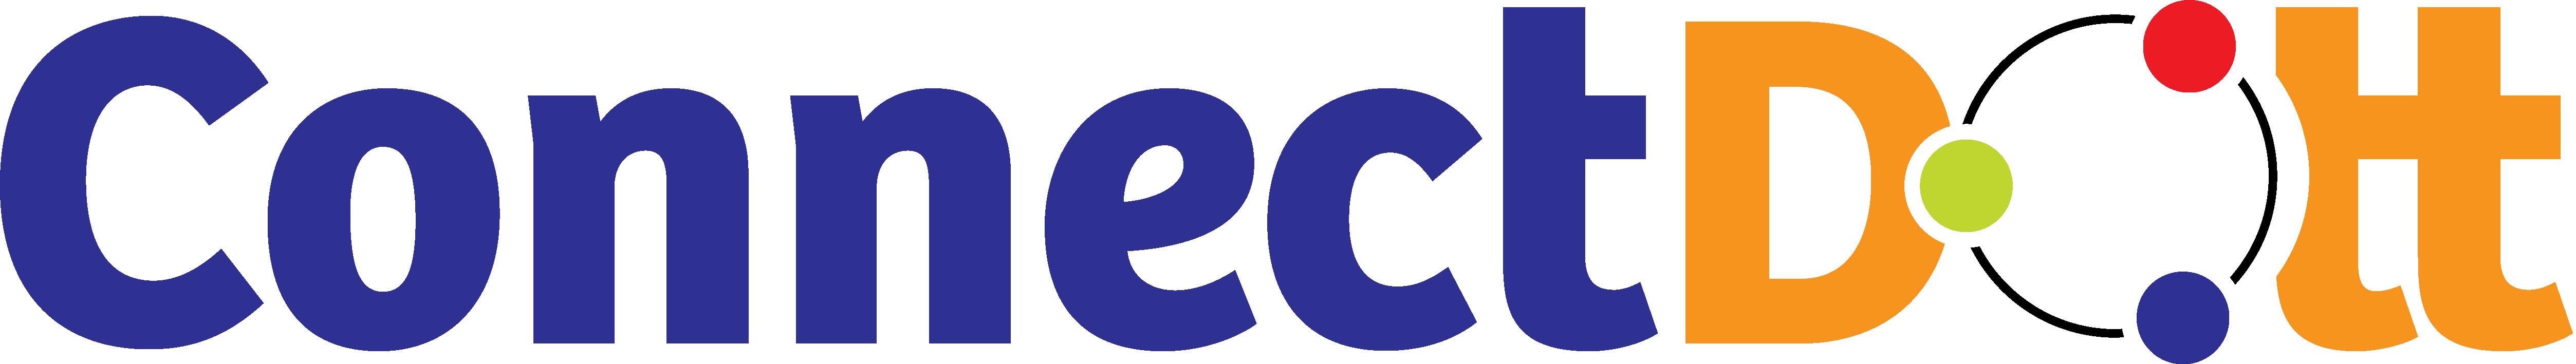 ConnectDott